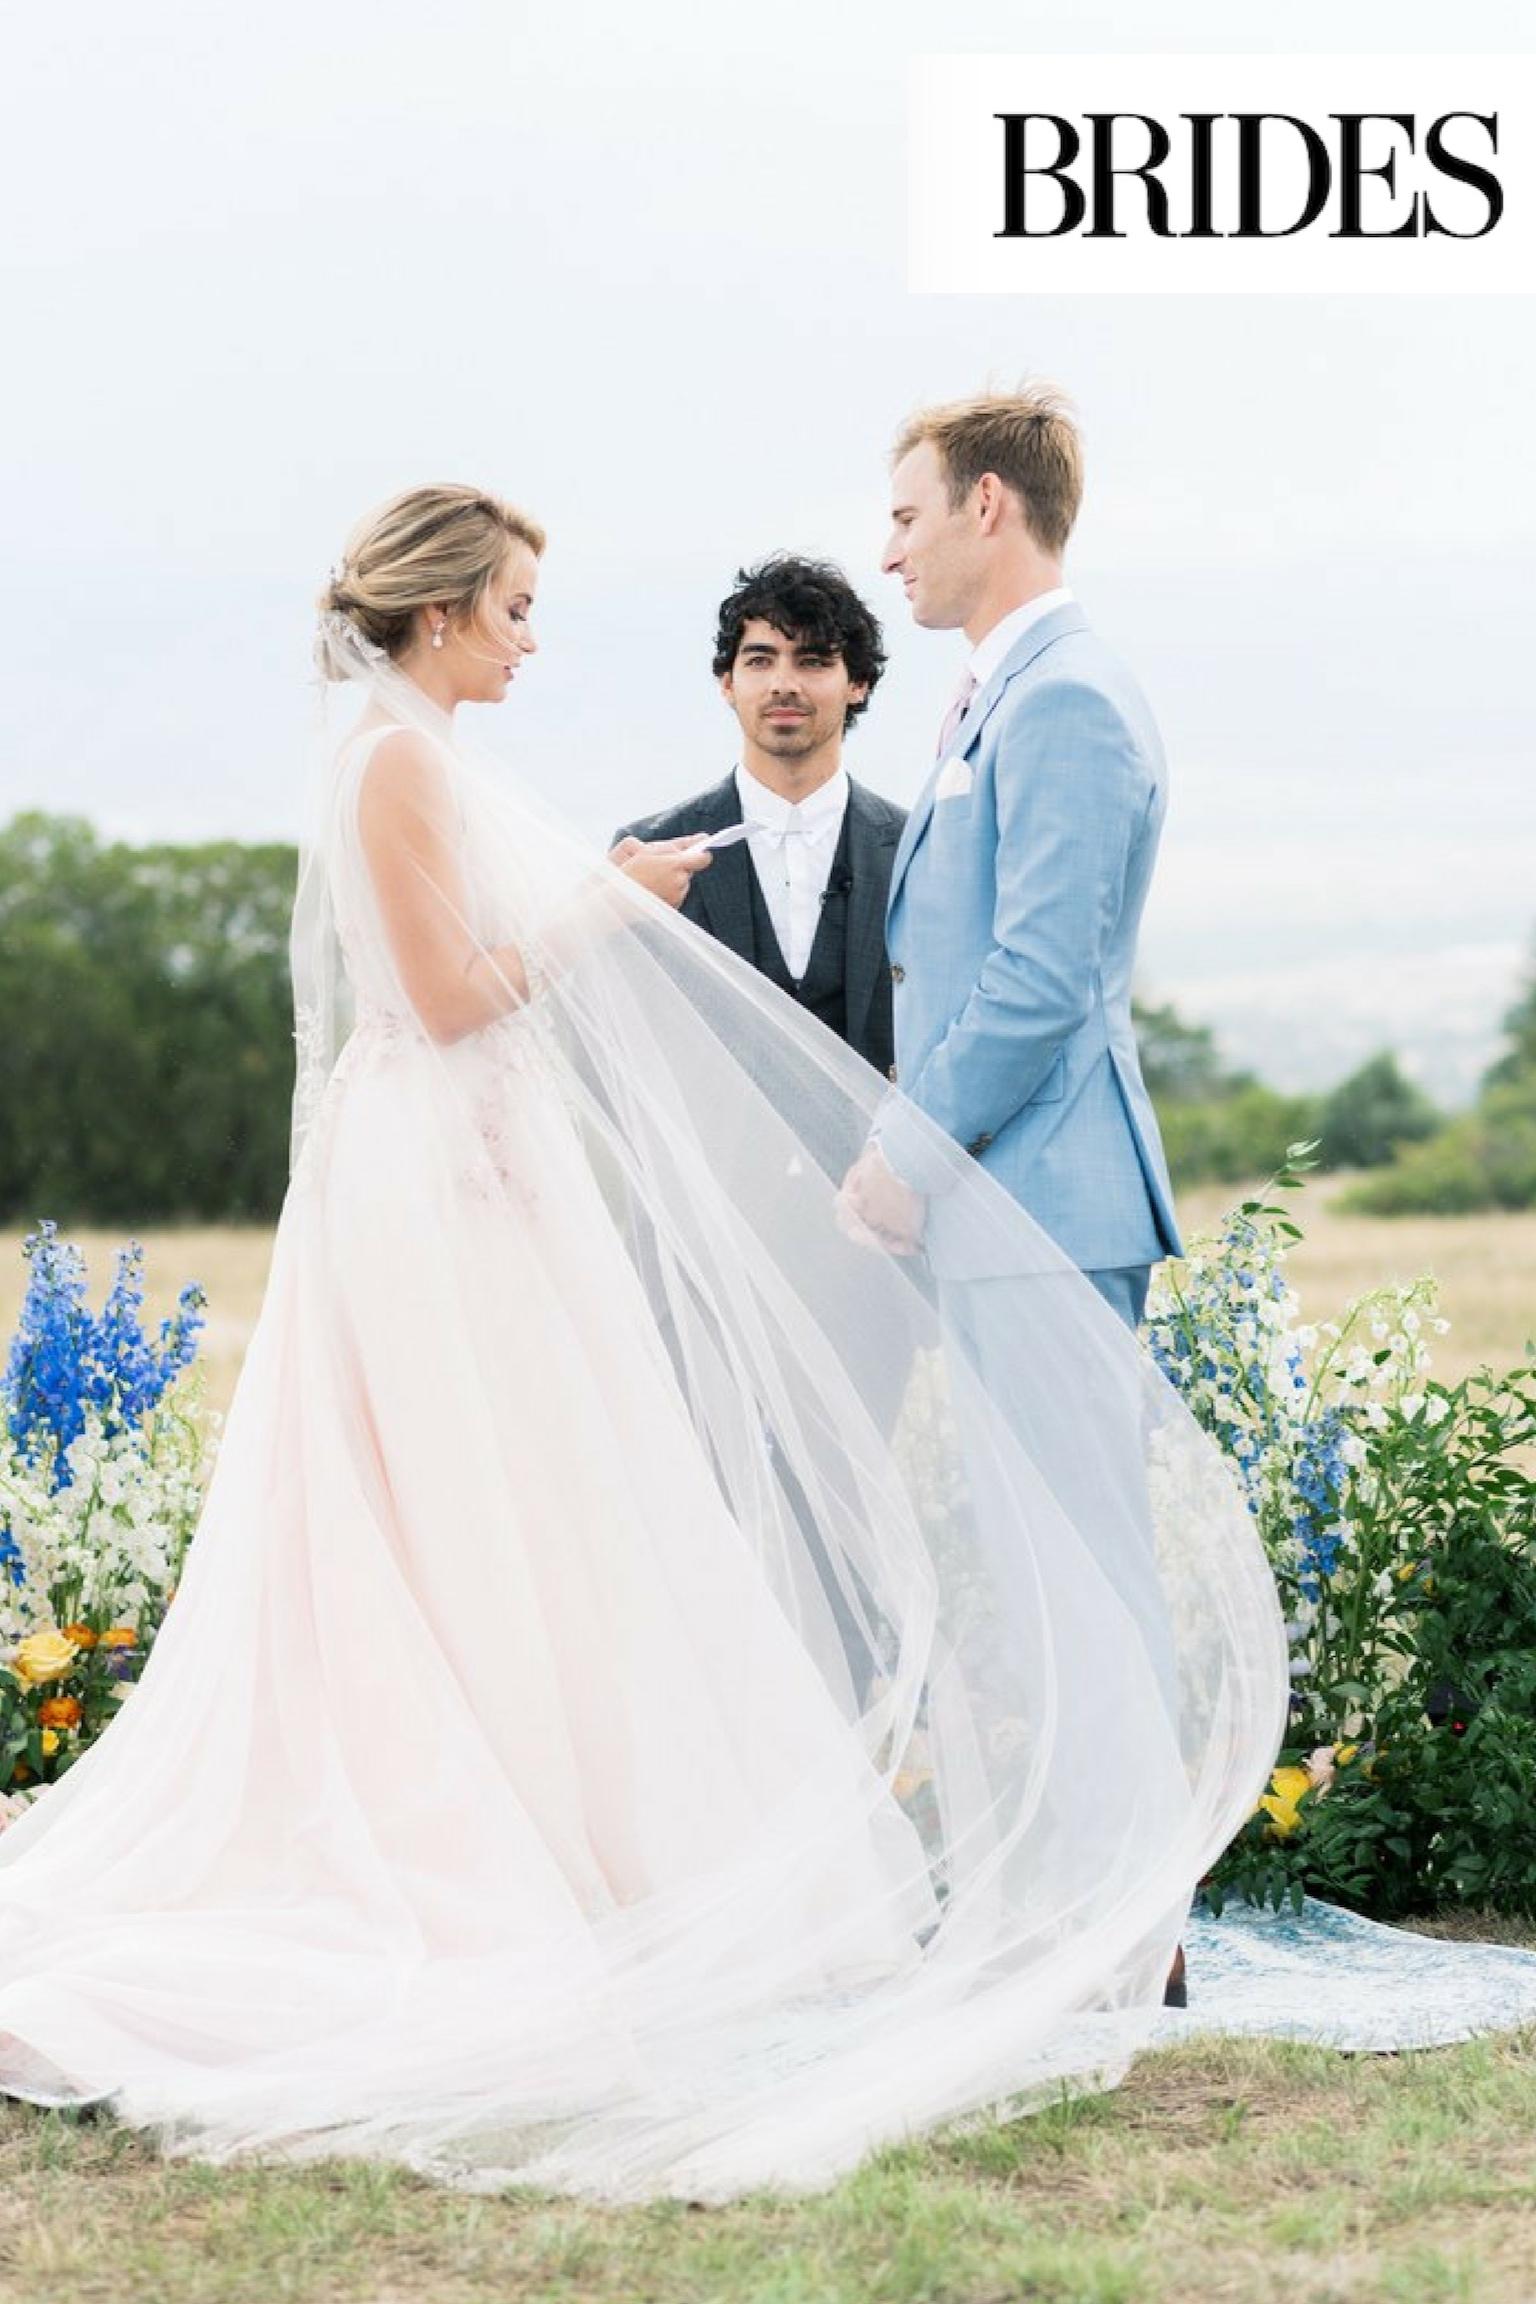 BRIDES MAGAZINE - Bride Haley and husband Brandon's wedding officiated by Joe Jonas